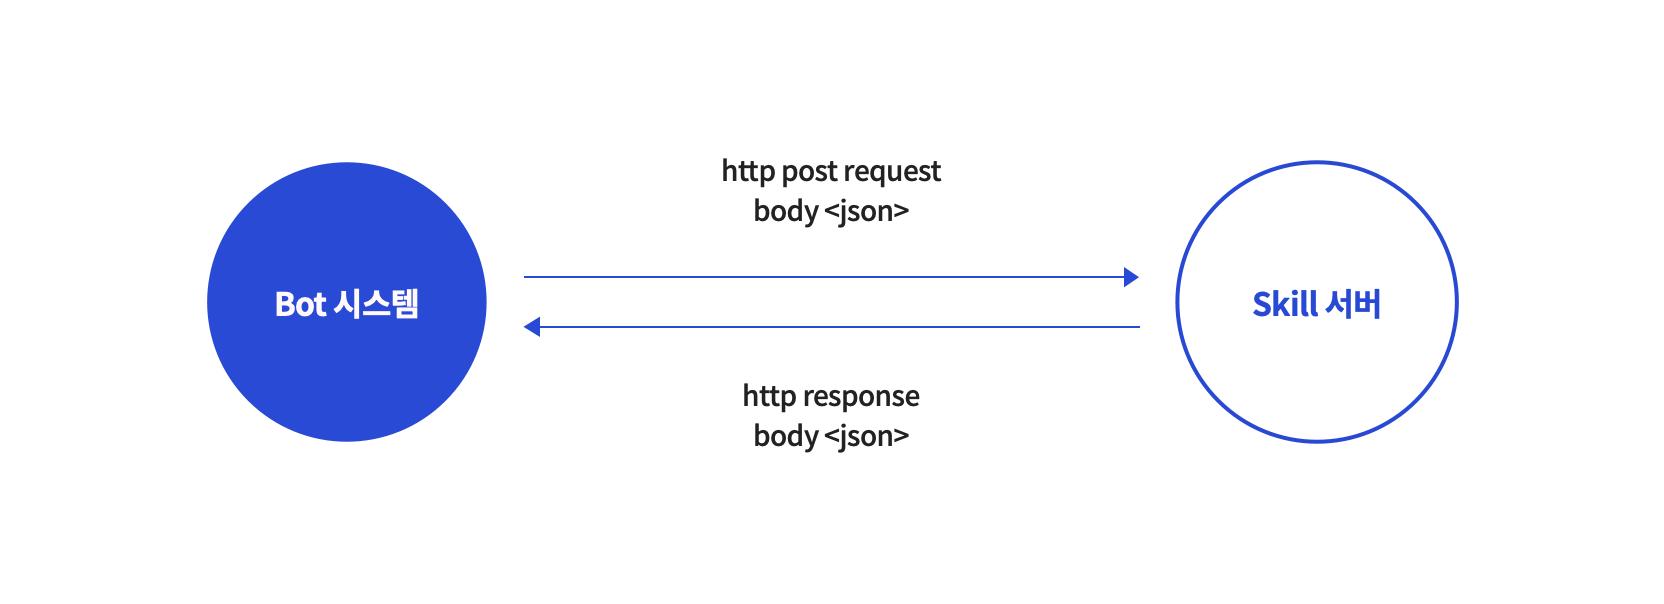 Bot 시스템 요청과 Skill 서버 응답